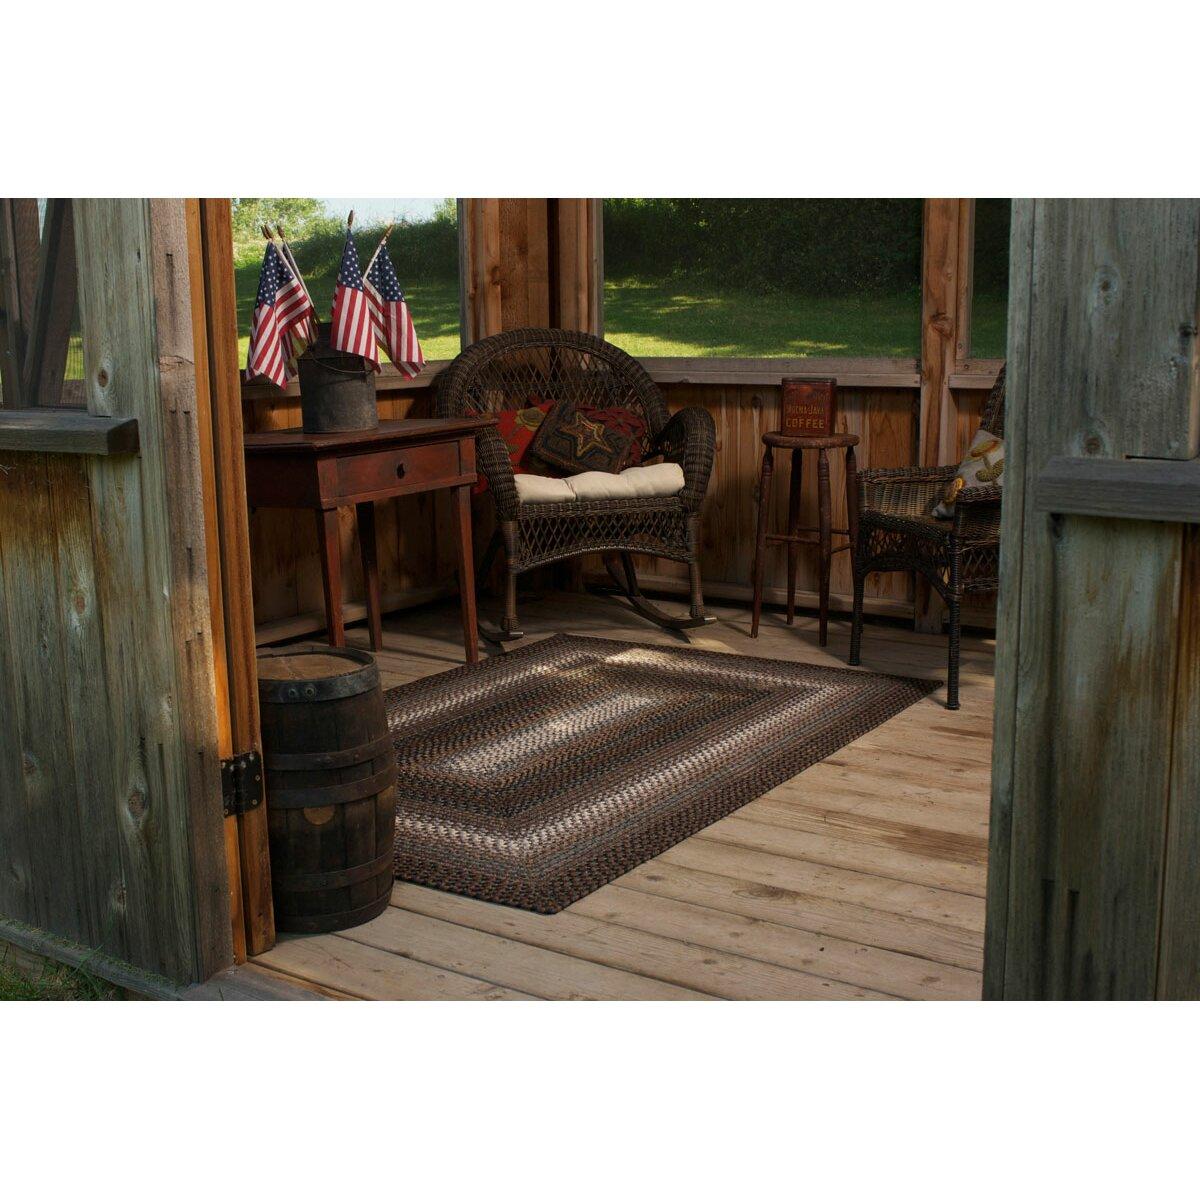 Homespice decor ultra durable driftwood indoor outdoor rug for Indoor outdoor decor